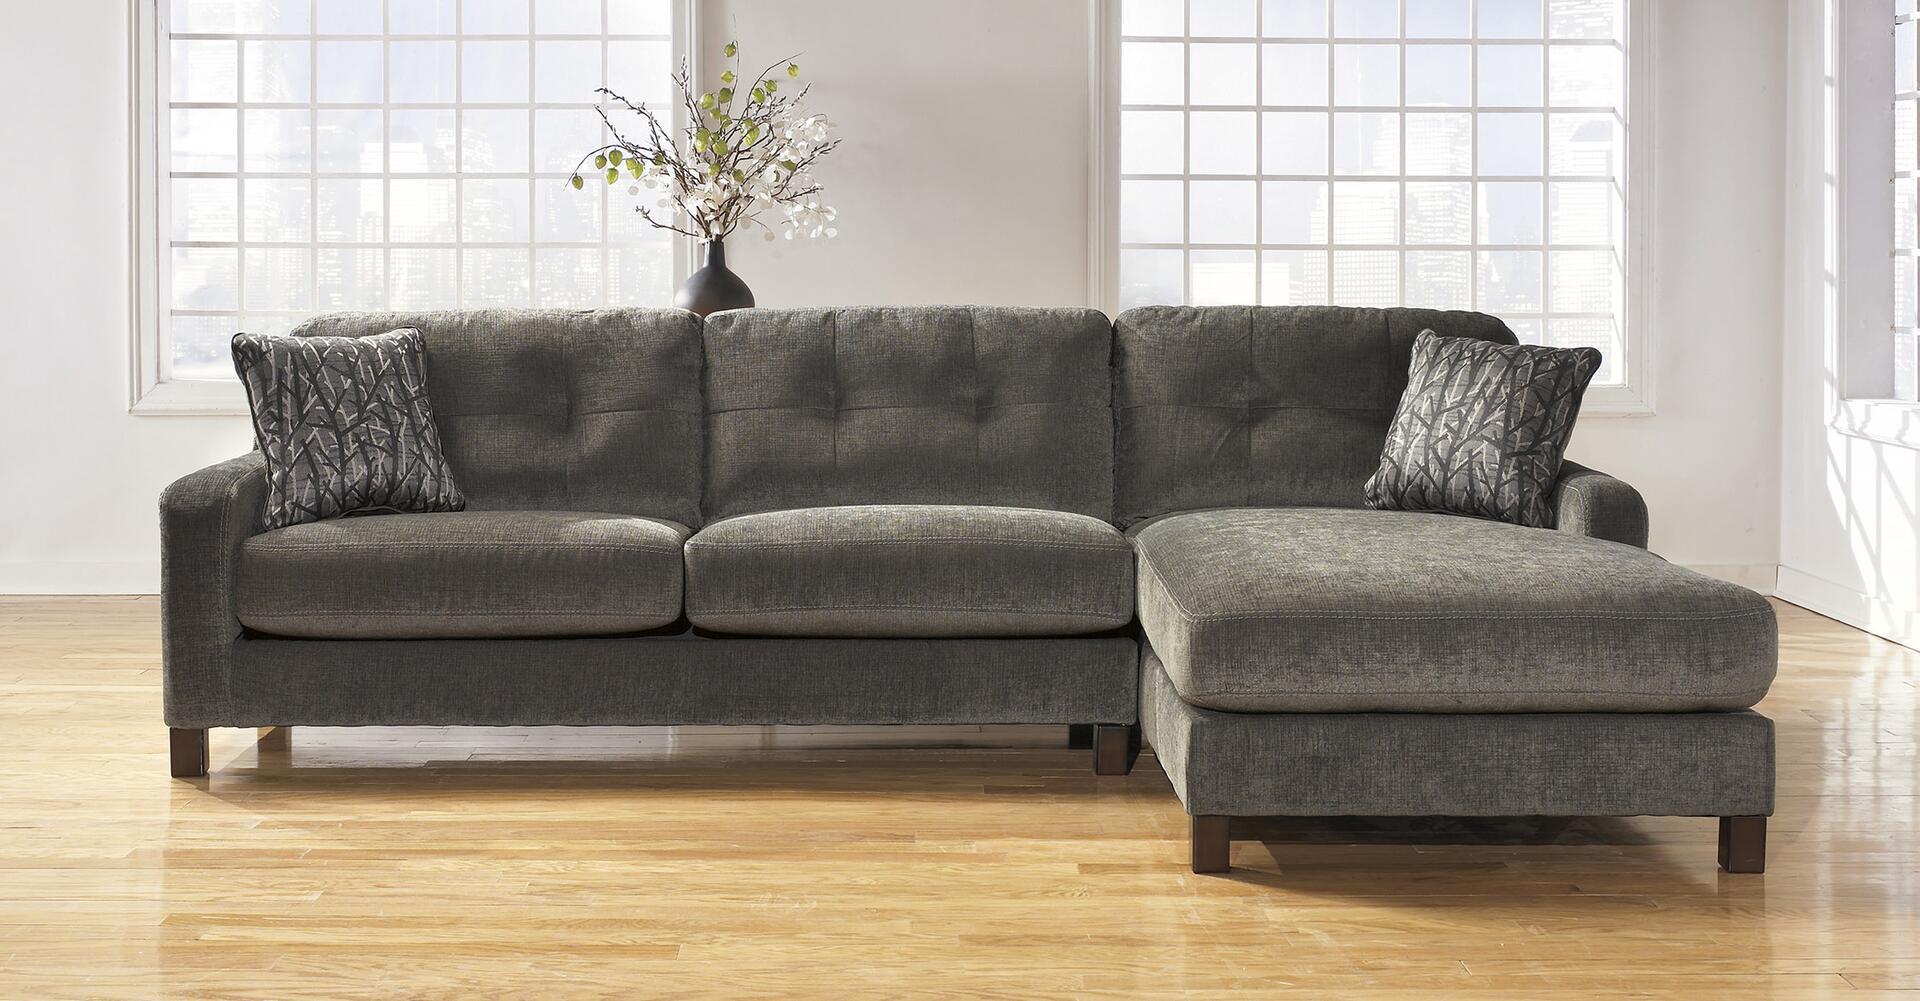 Ashley Furniture Signature Design Siroun Steel Sectional ...